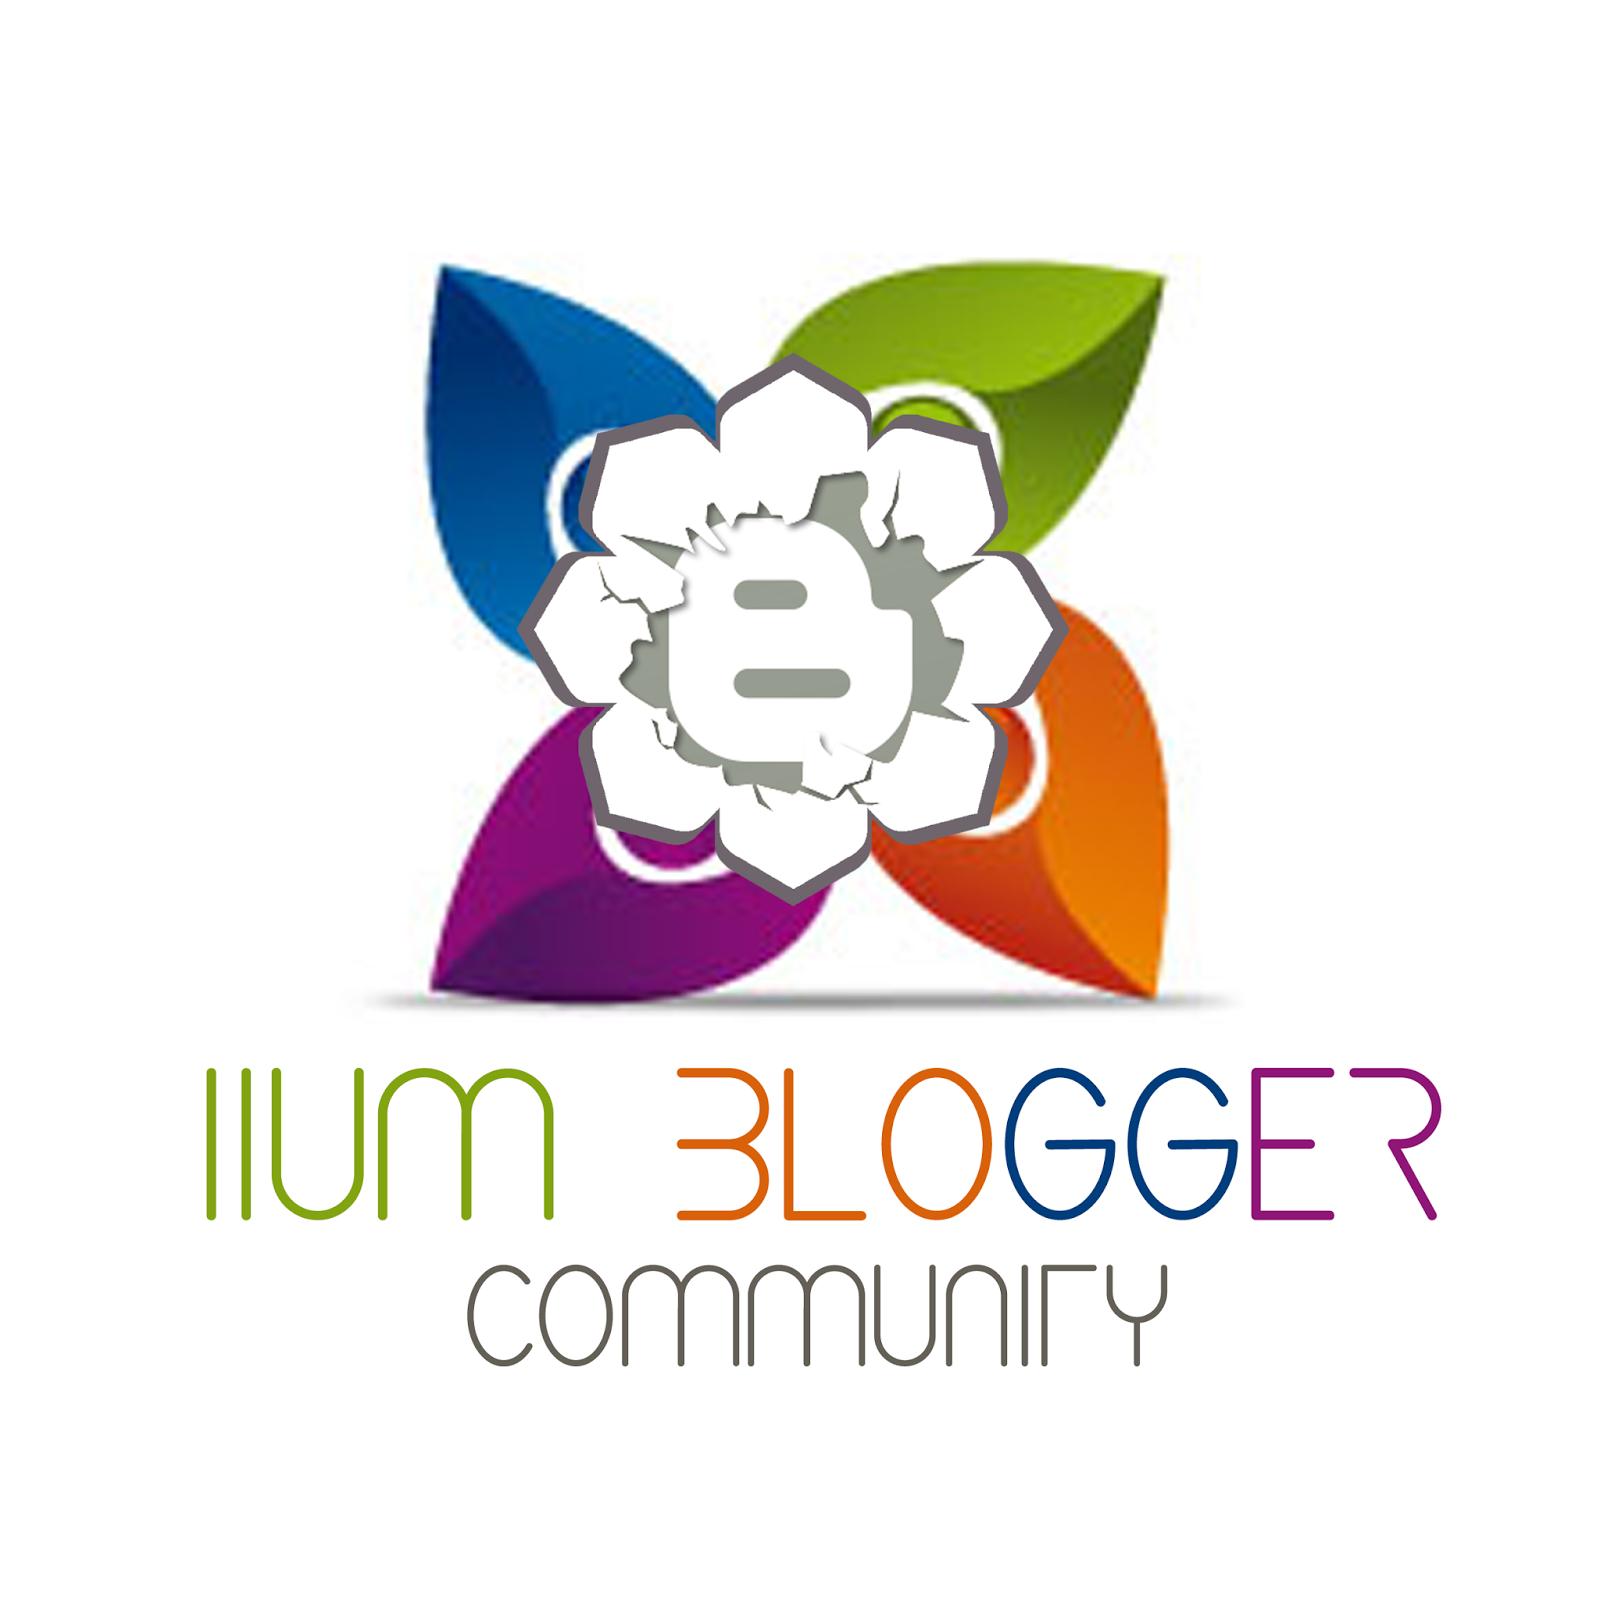 IIUM Blogger